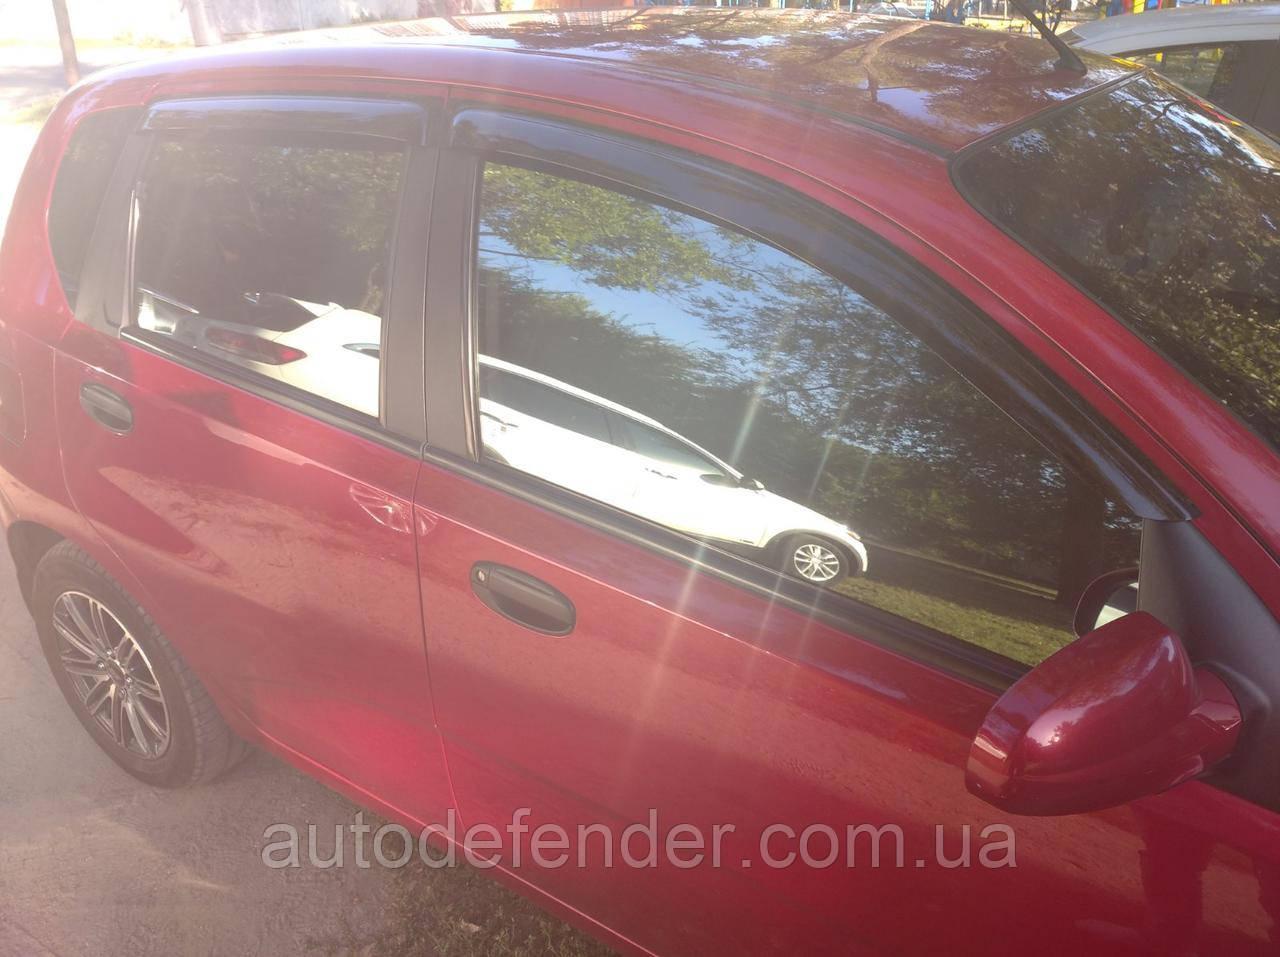 Дефлекторы окон (ветровики) Chevrolet Aveo 5d hatchback T200 + T255 + ЗАЗ Vida, ANV - Cobra Tuning, C30103